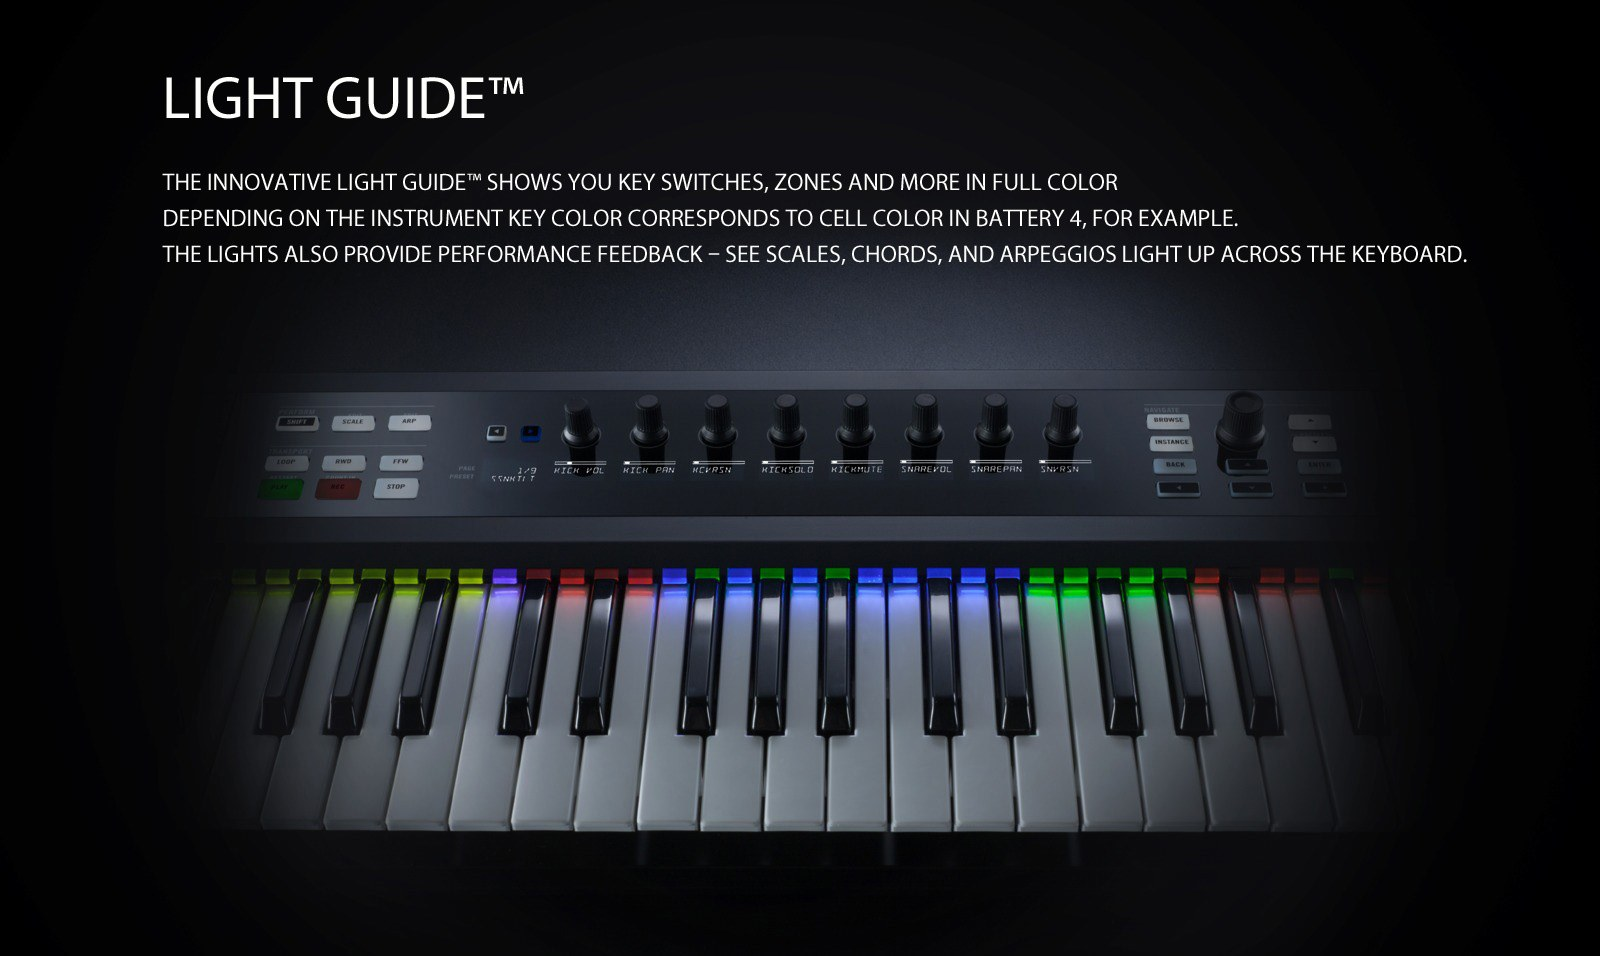 komplete kontrol - lightguide